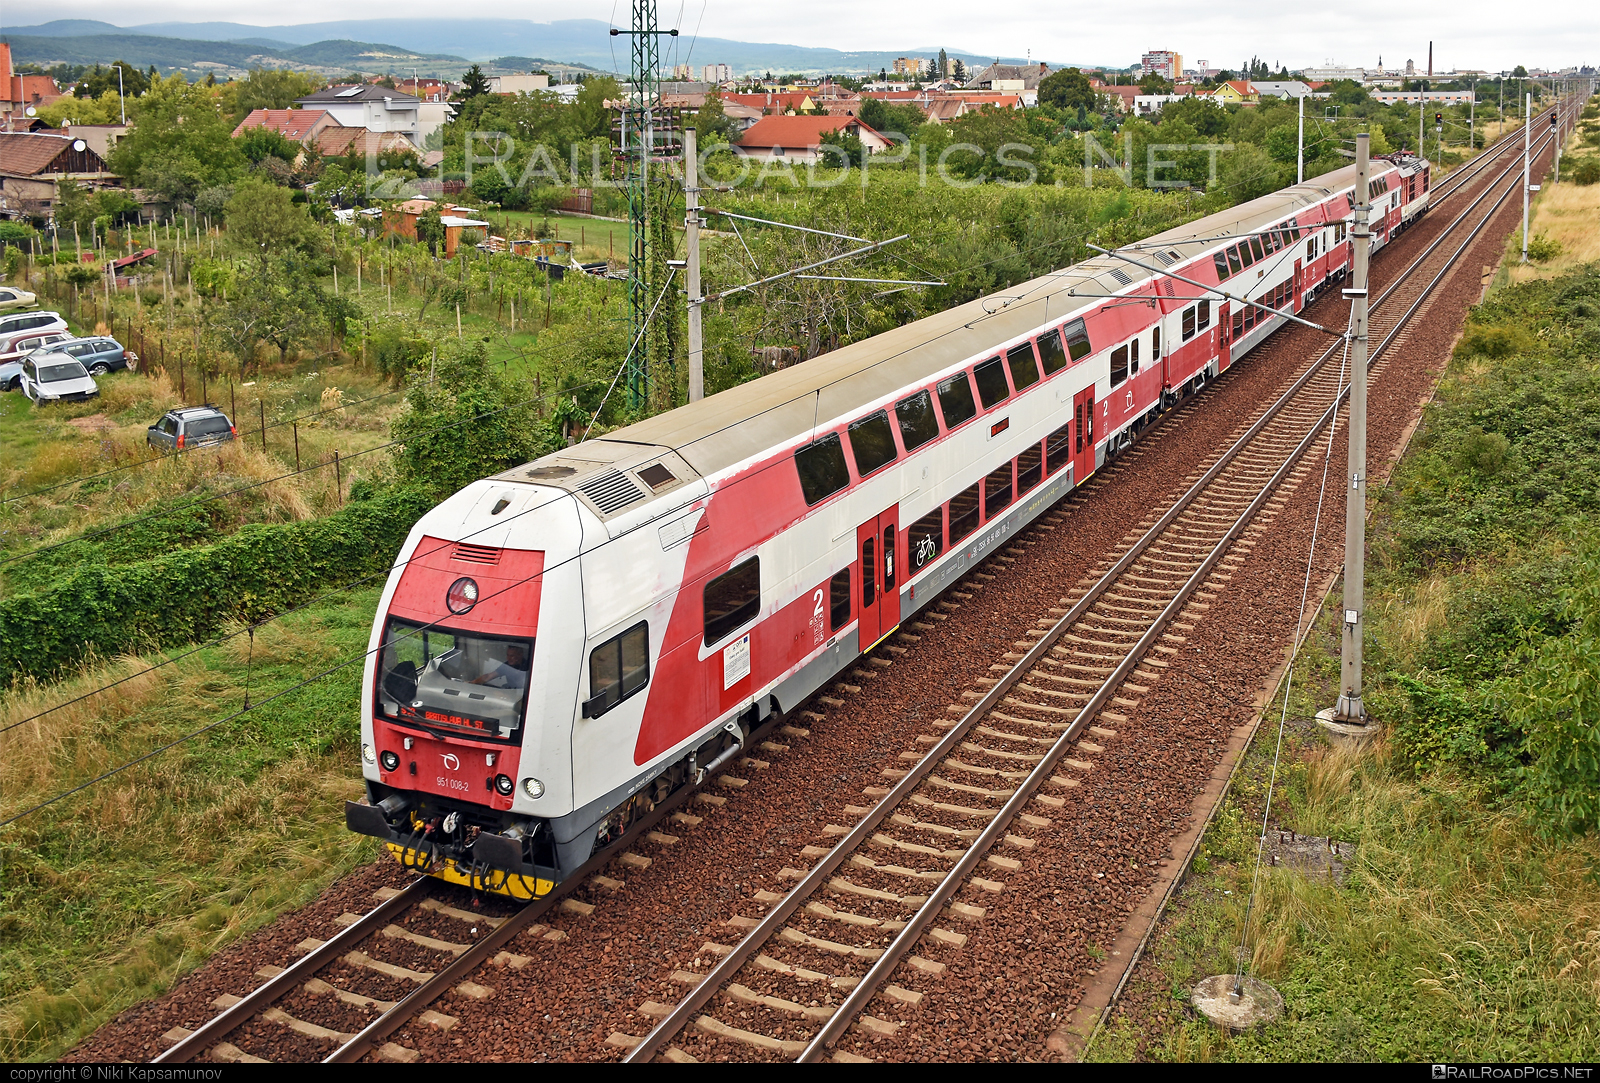 Škoda 4Ev - 951 008-2 operated by Železničná Spoločnost' Slovensko, a.s. #ZeleznicnaSpolocnostSlovensko #emu671 #skoda #skoda4ev #skodaclass671 #zssk